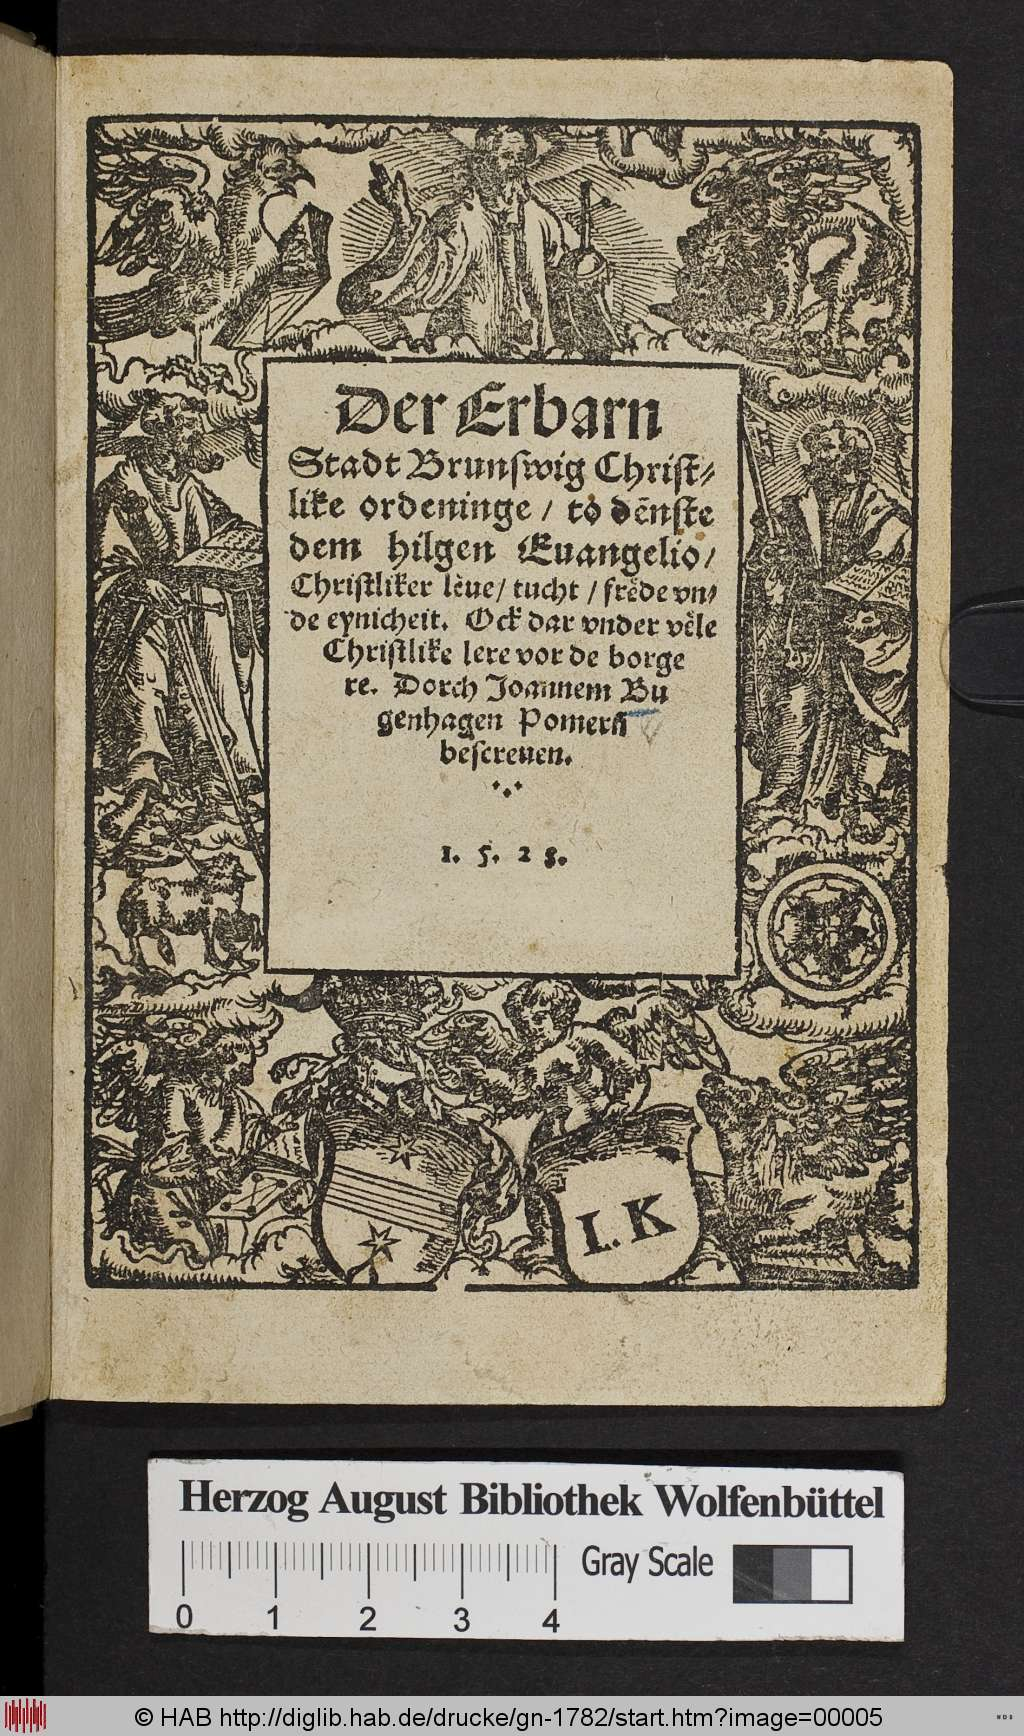 http://diglib.hab.de/drucke/gn-1782/00005.jpg